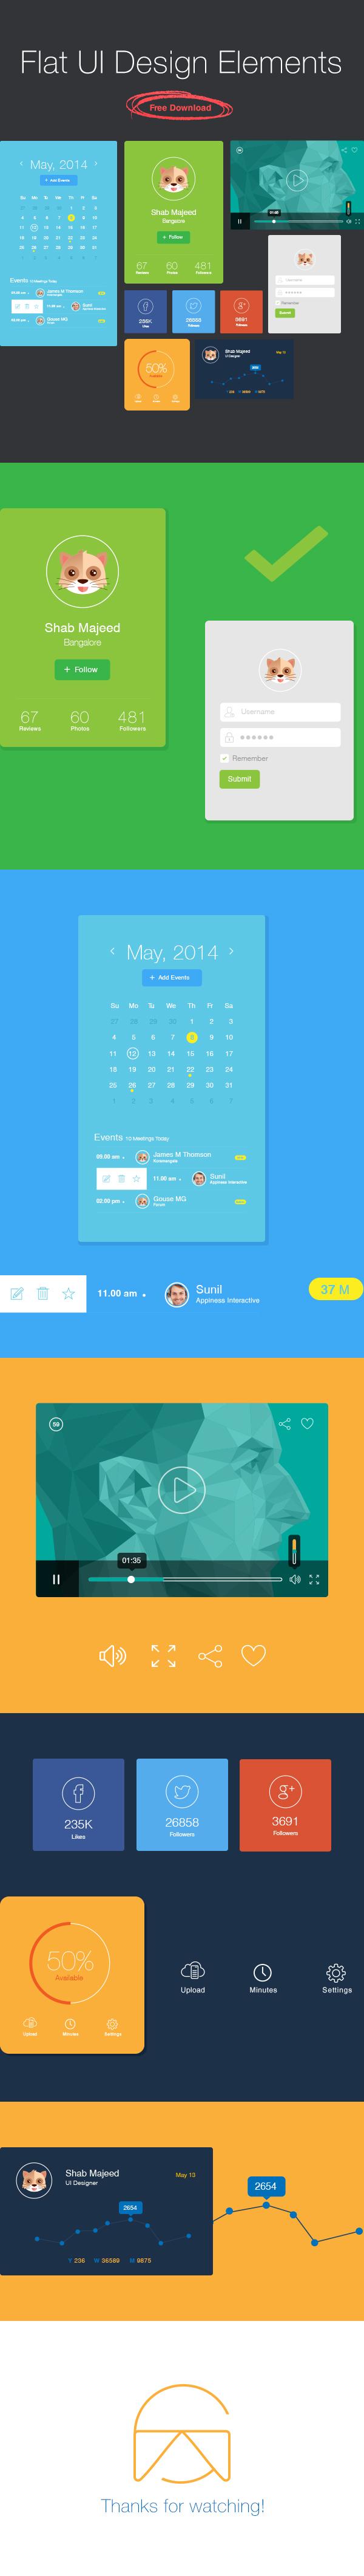 Vector Flat UI Design Elements Download